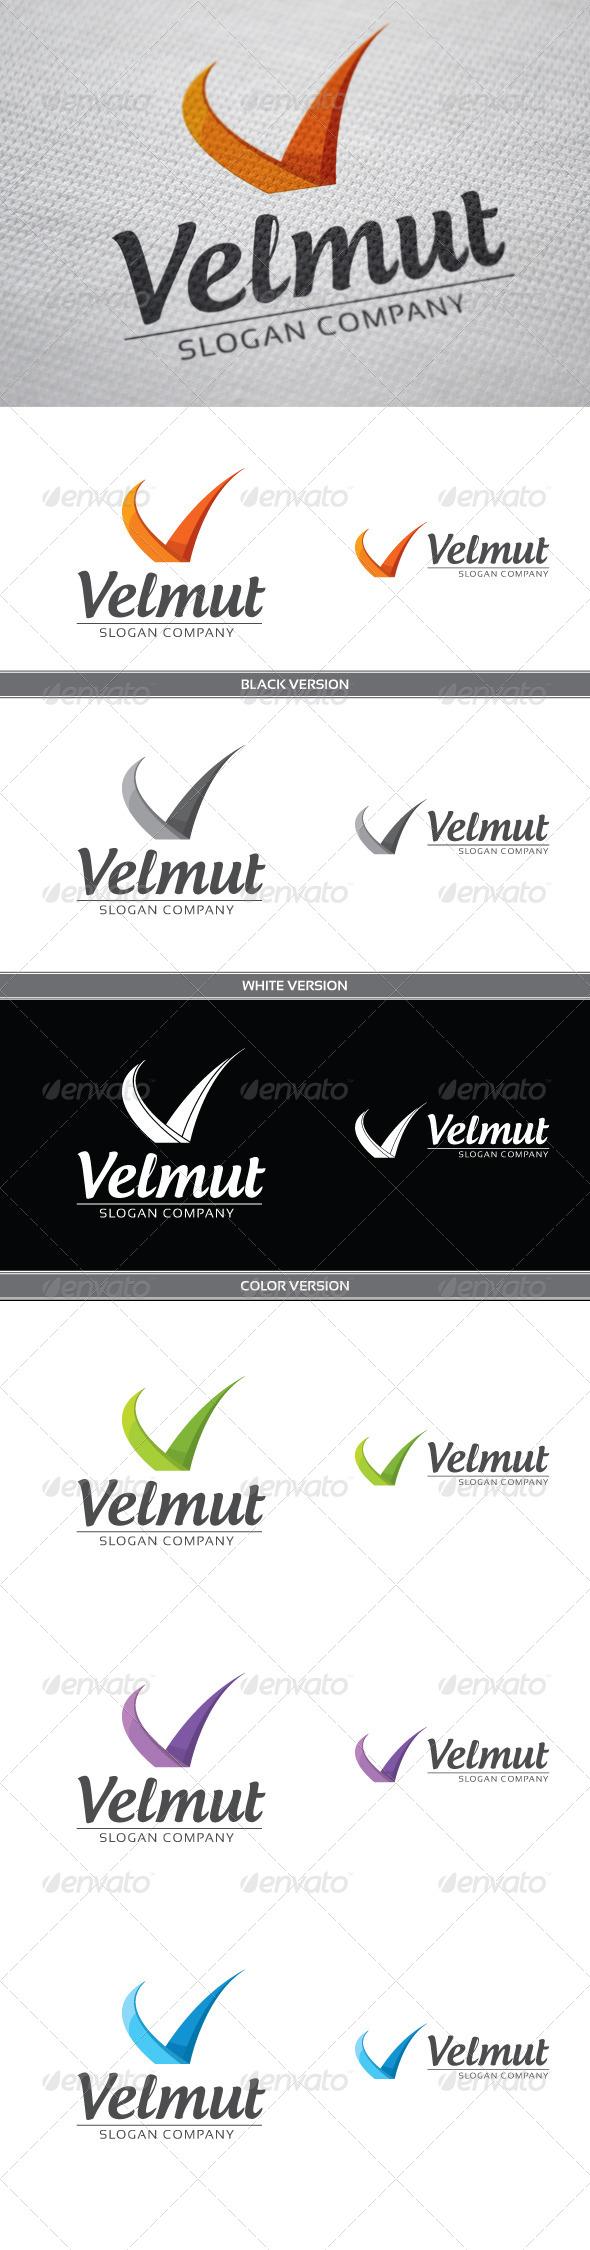 GraphicRiver Velmut 4203197